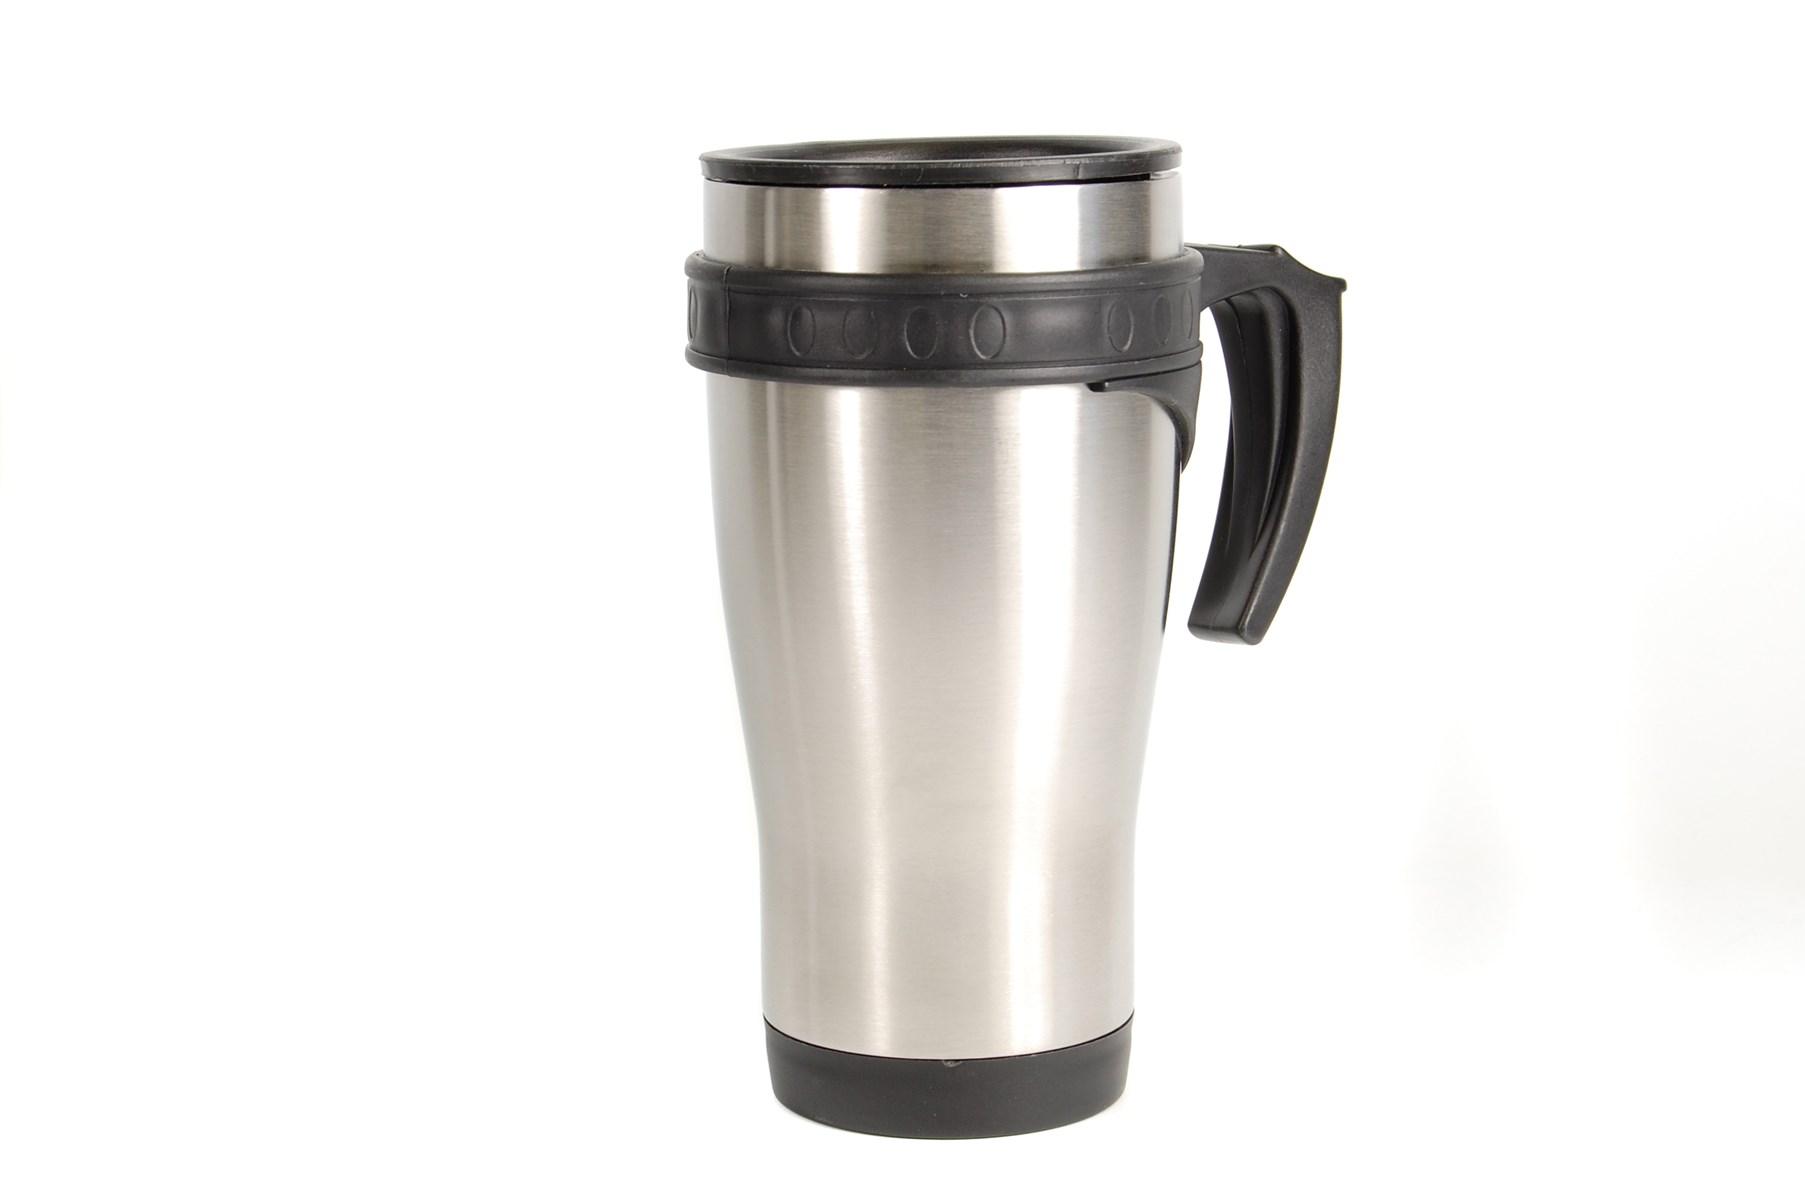 thermal mug coffee first thermal mug the created co  x  - gelert thermal travel mug £